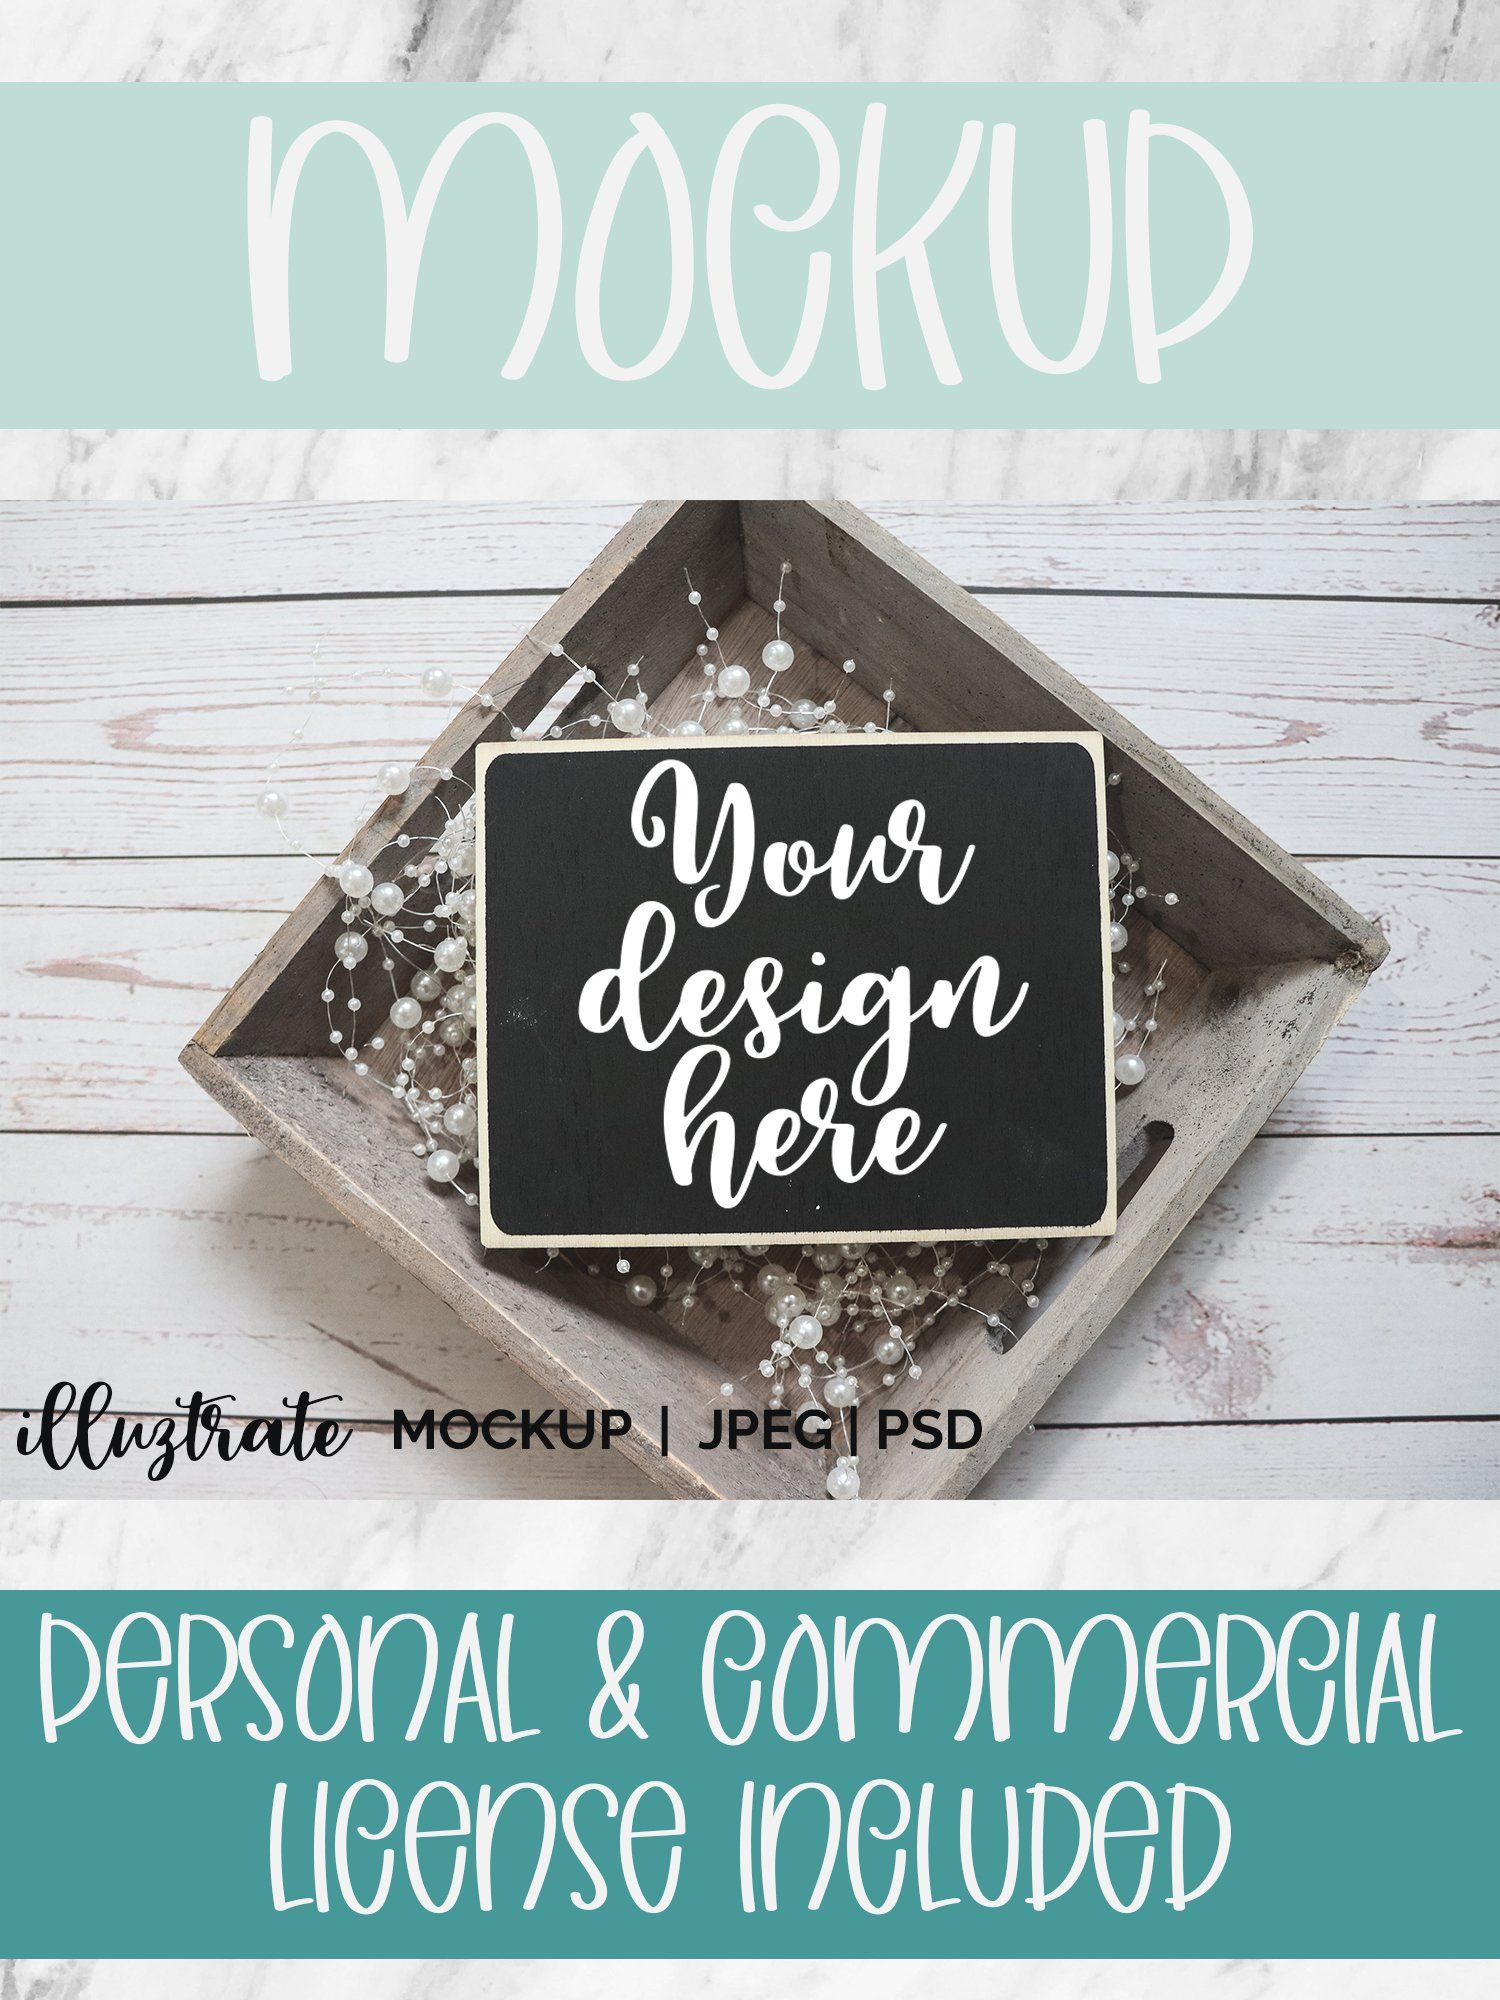 Black Sign Mockup Styled Stock Photography Mockup Design In 2021 Photography Mockup Templates Free Design Sign Mockup